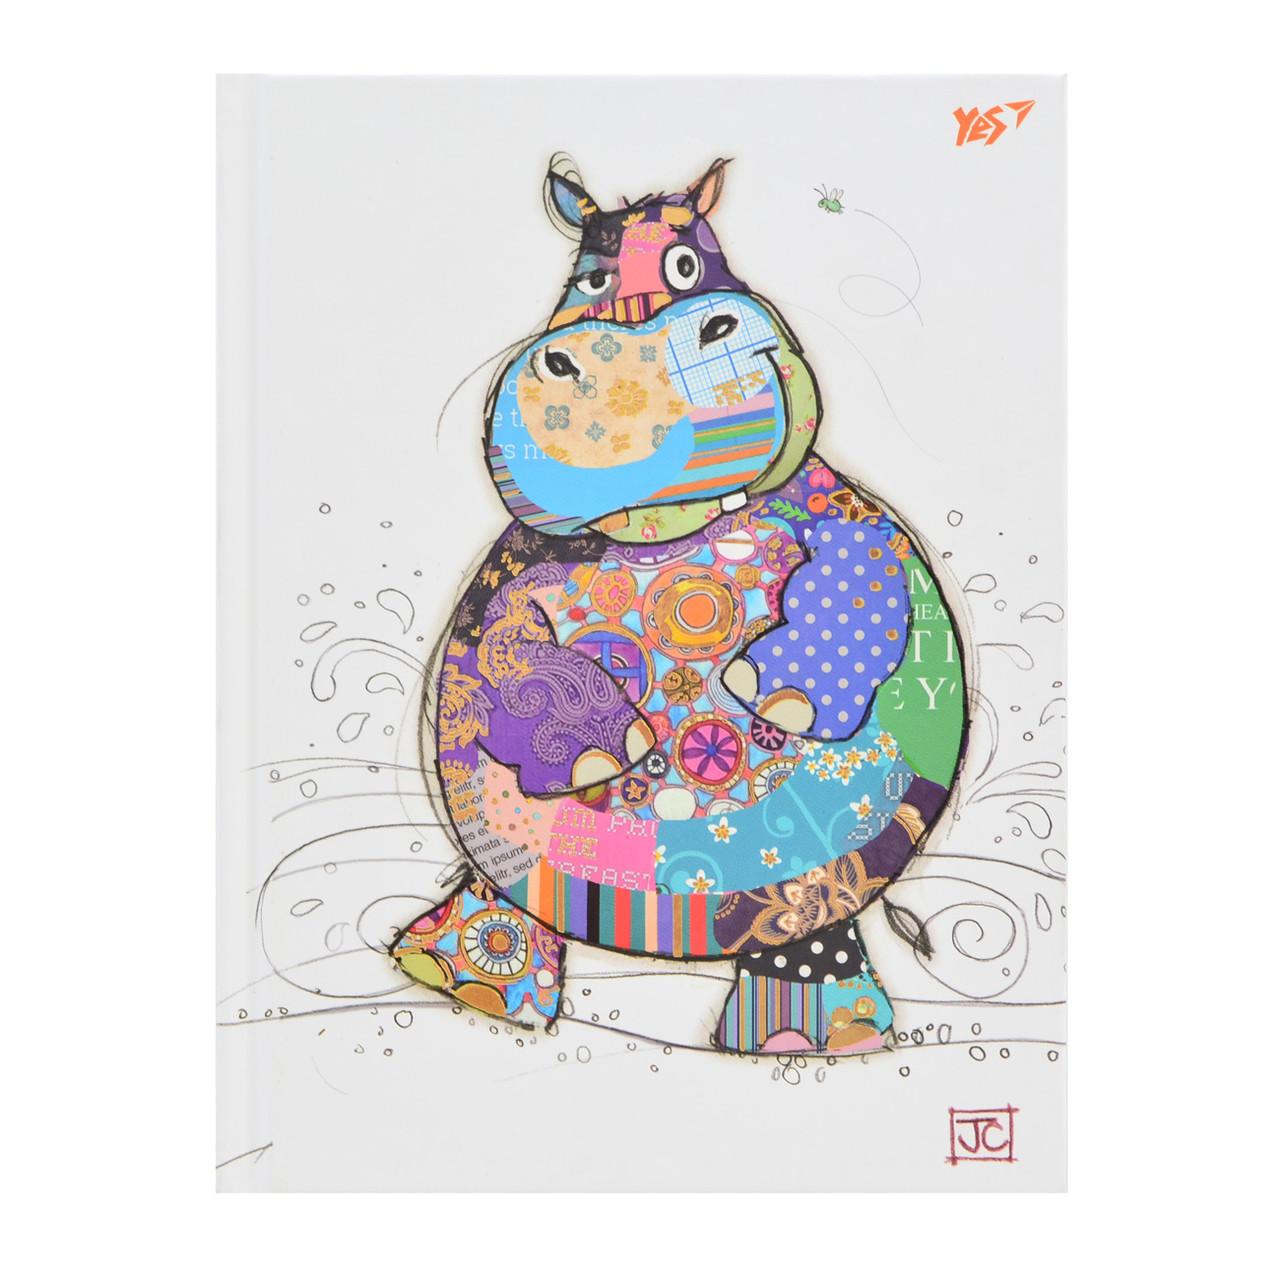 "Блокнот А5/96 КЛ. 7БЦ, фольга золото+Уф.выб. ""BugArt. White hippo"" YES     код: 151383"